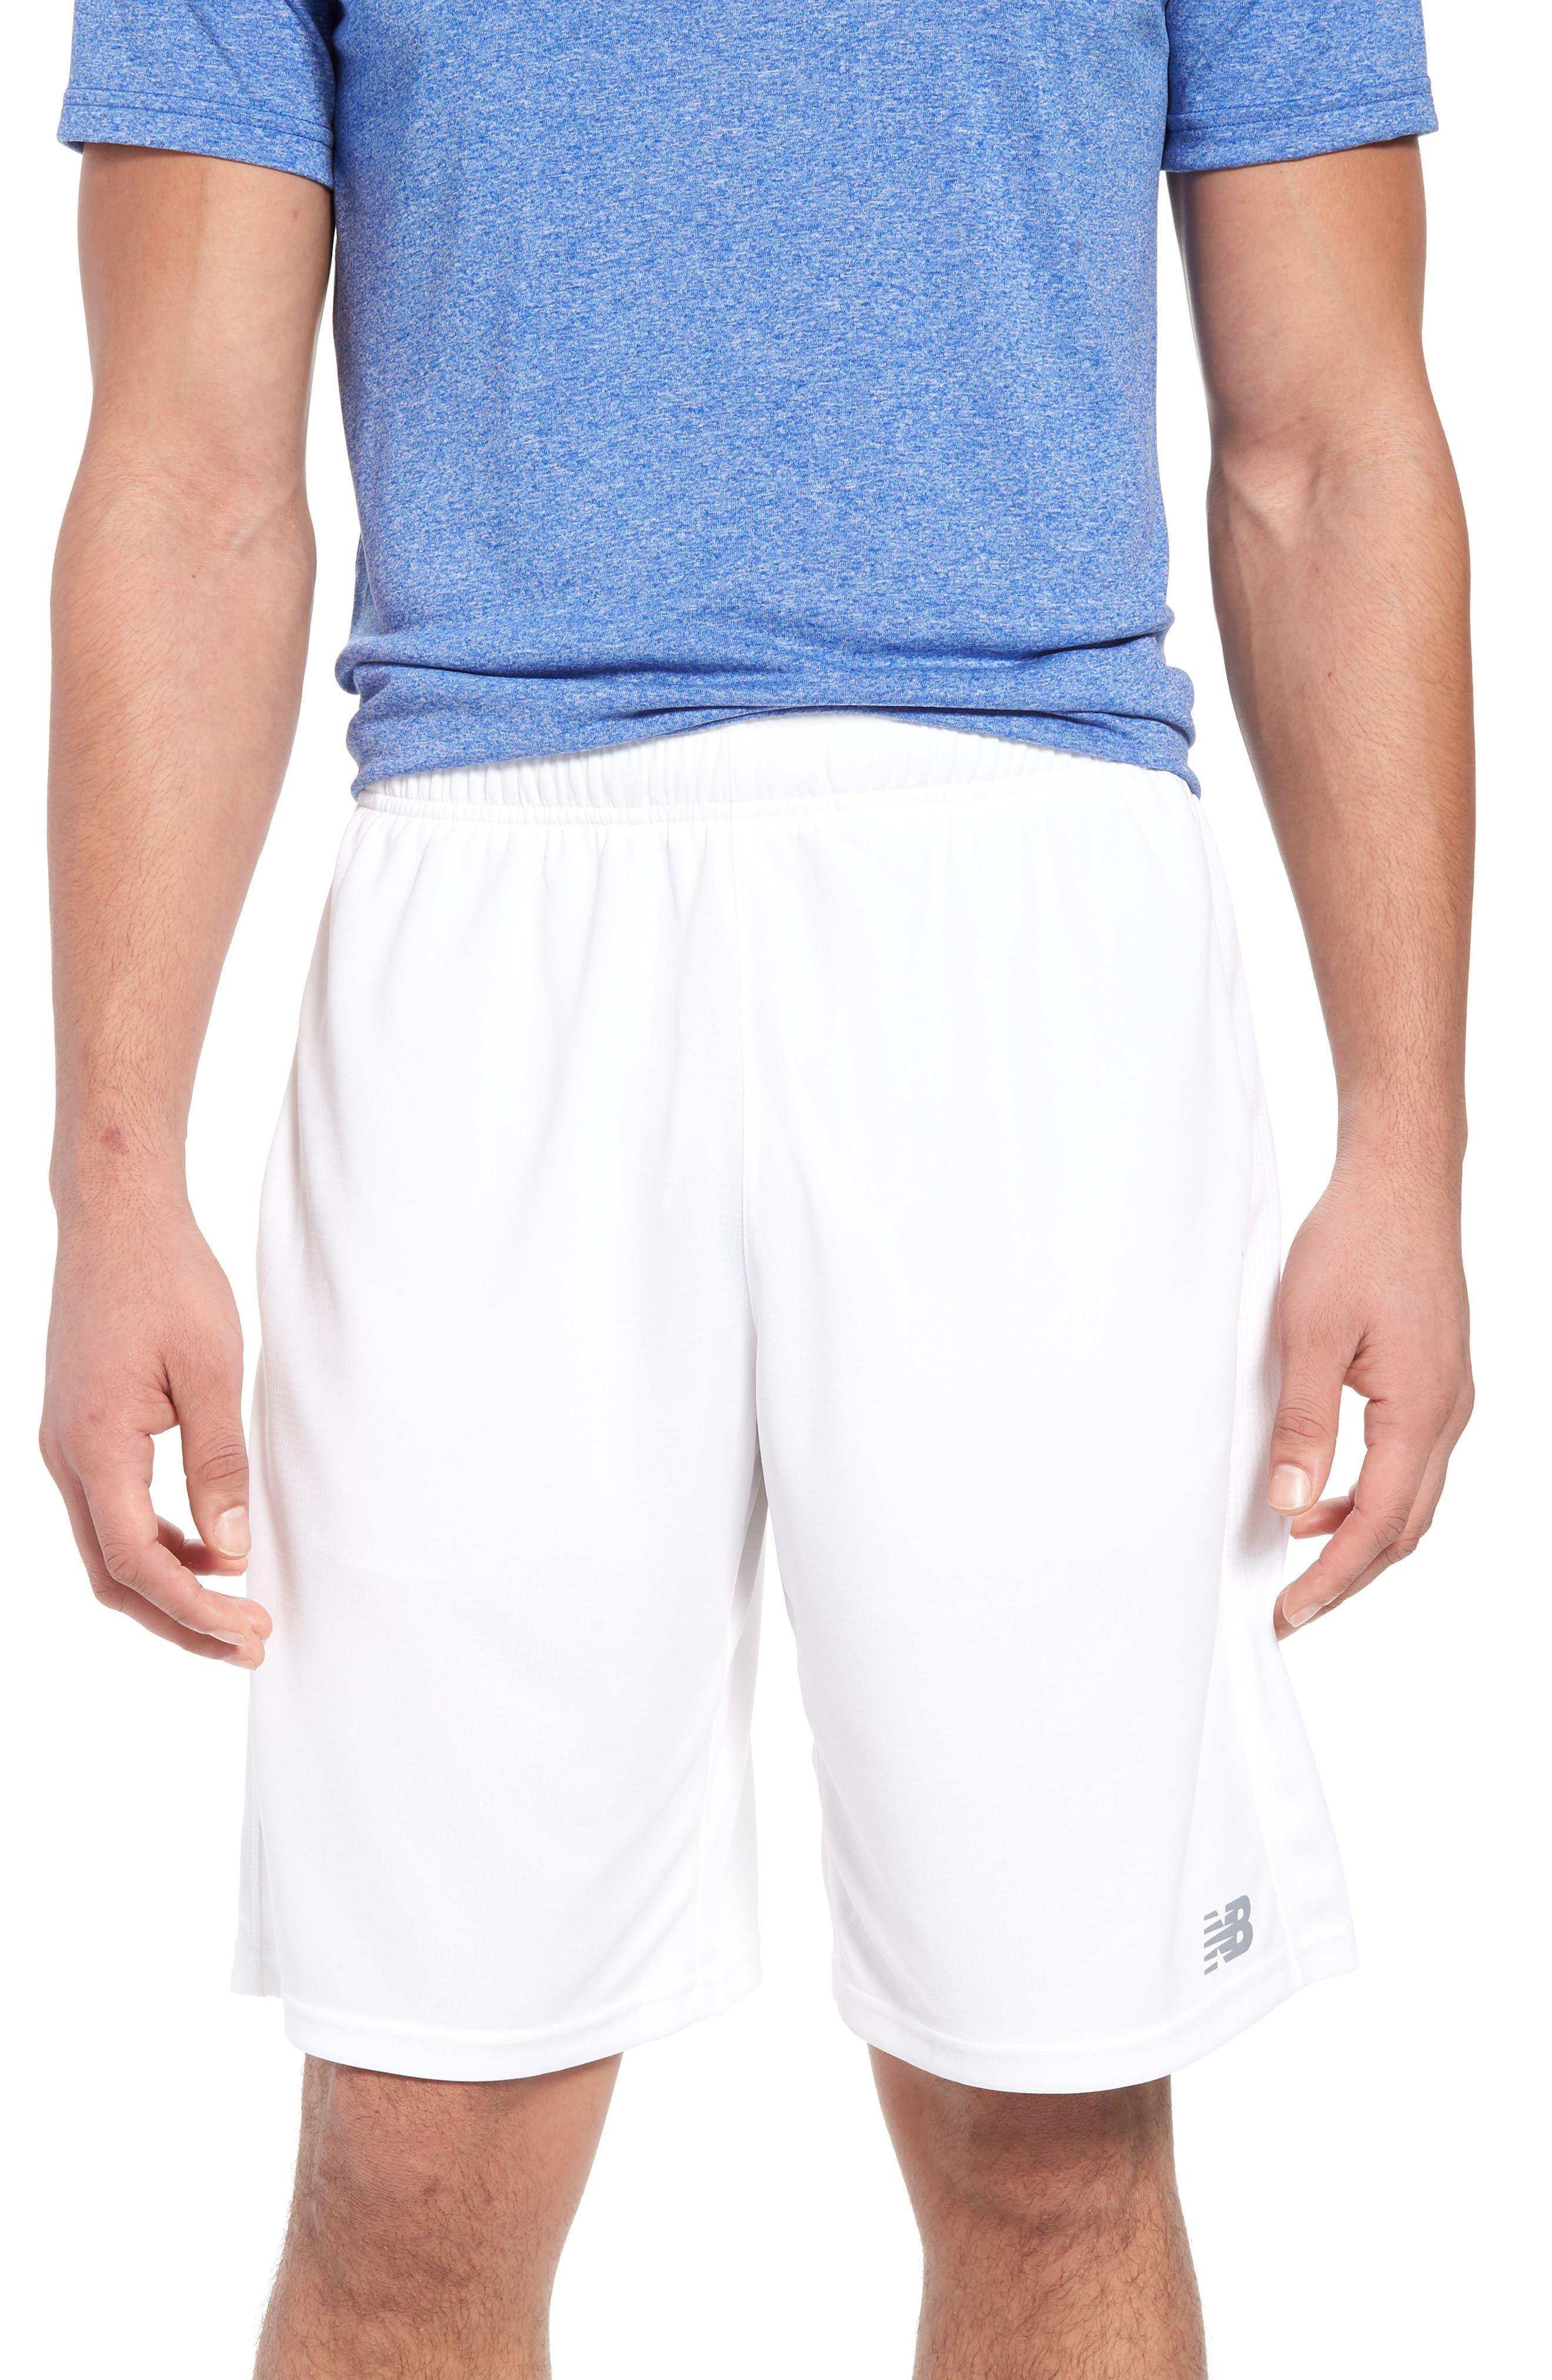 Alternate Image 1 Selected - New Balance Versa Shorts